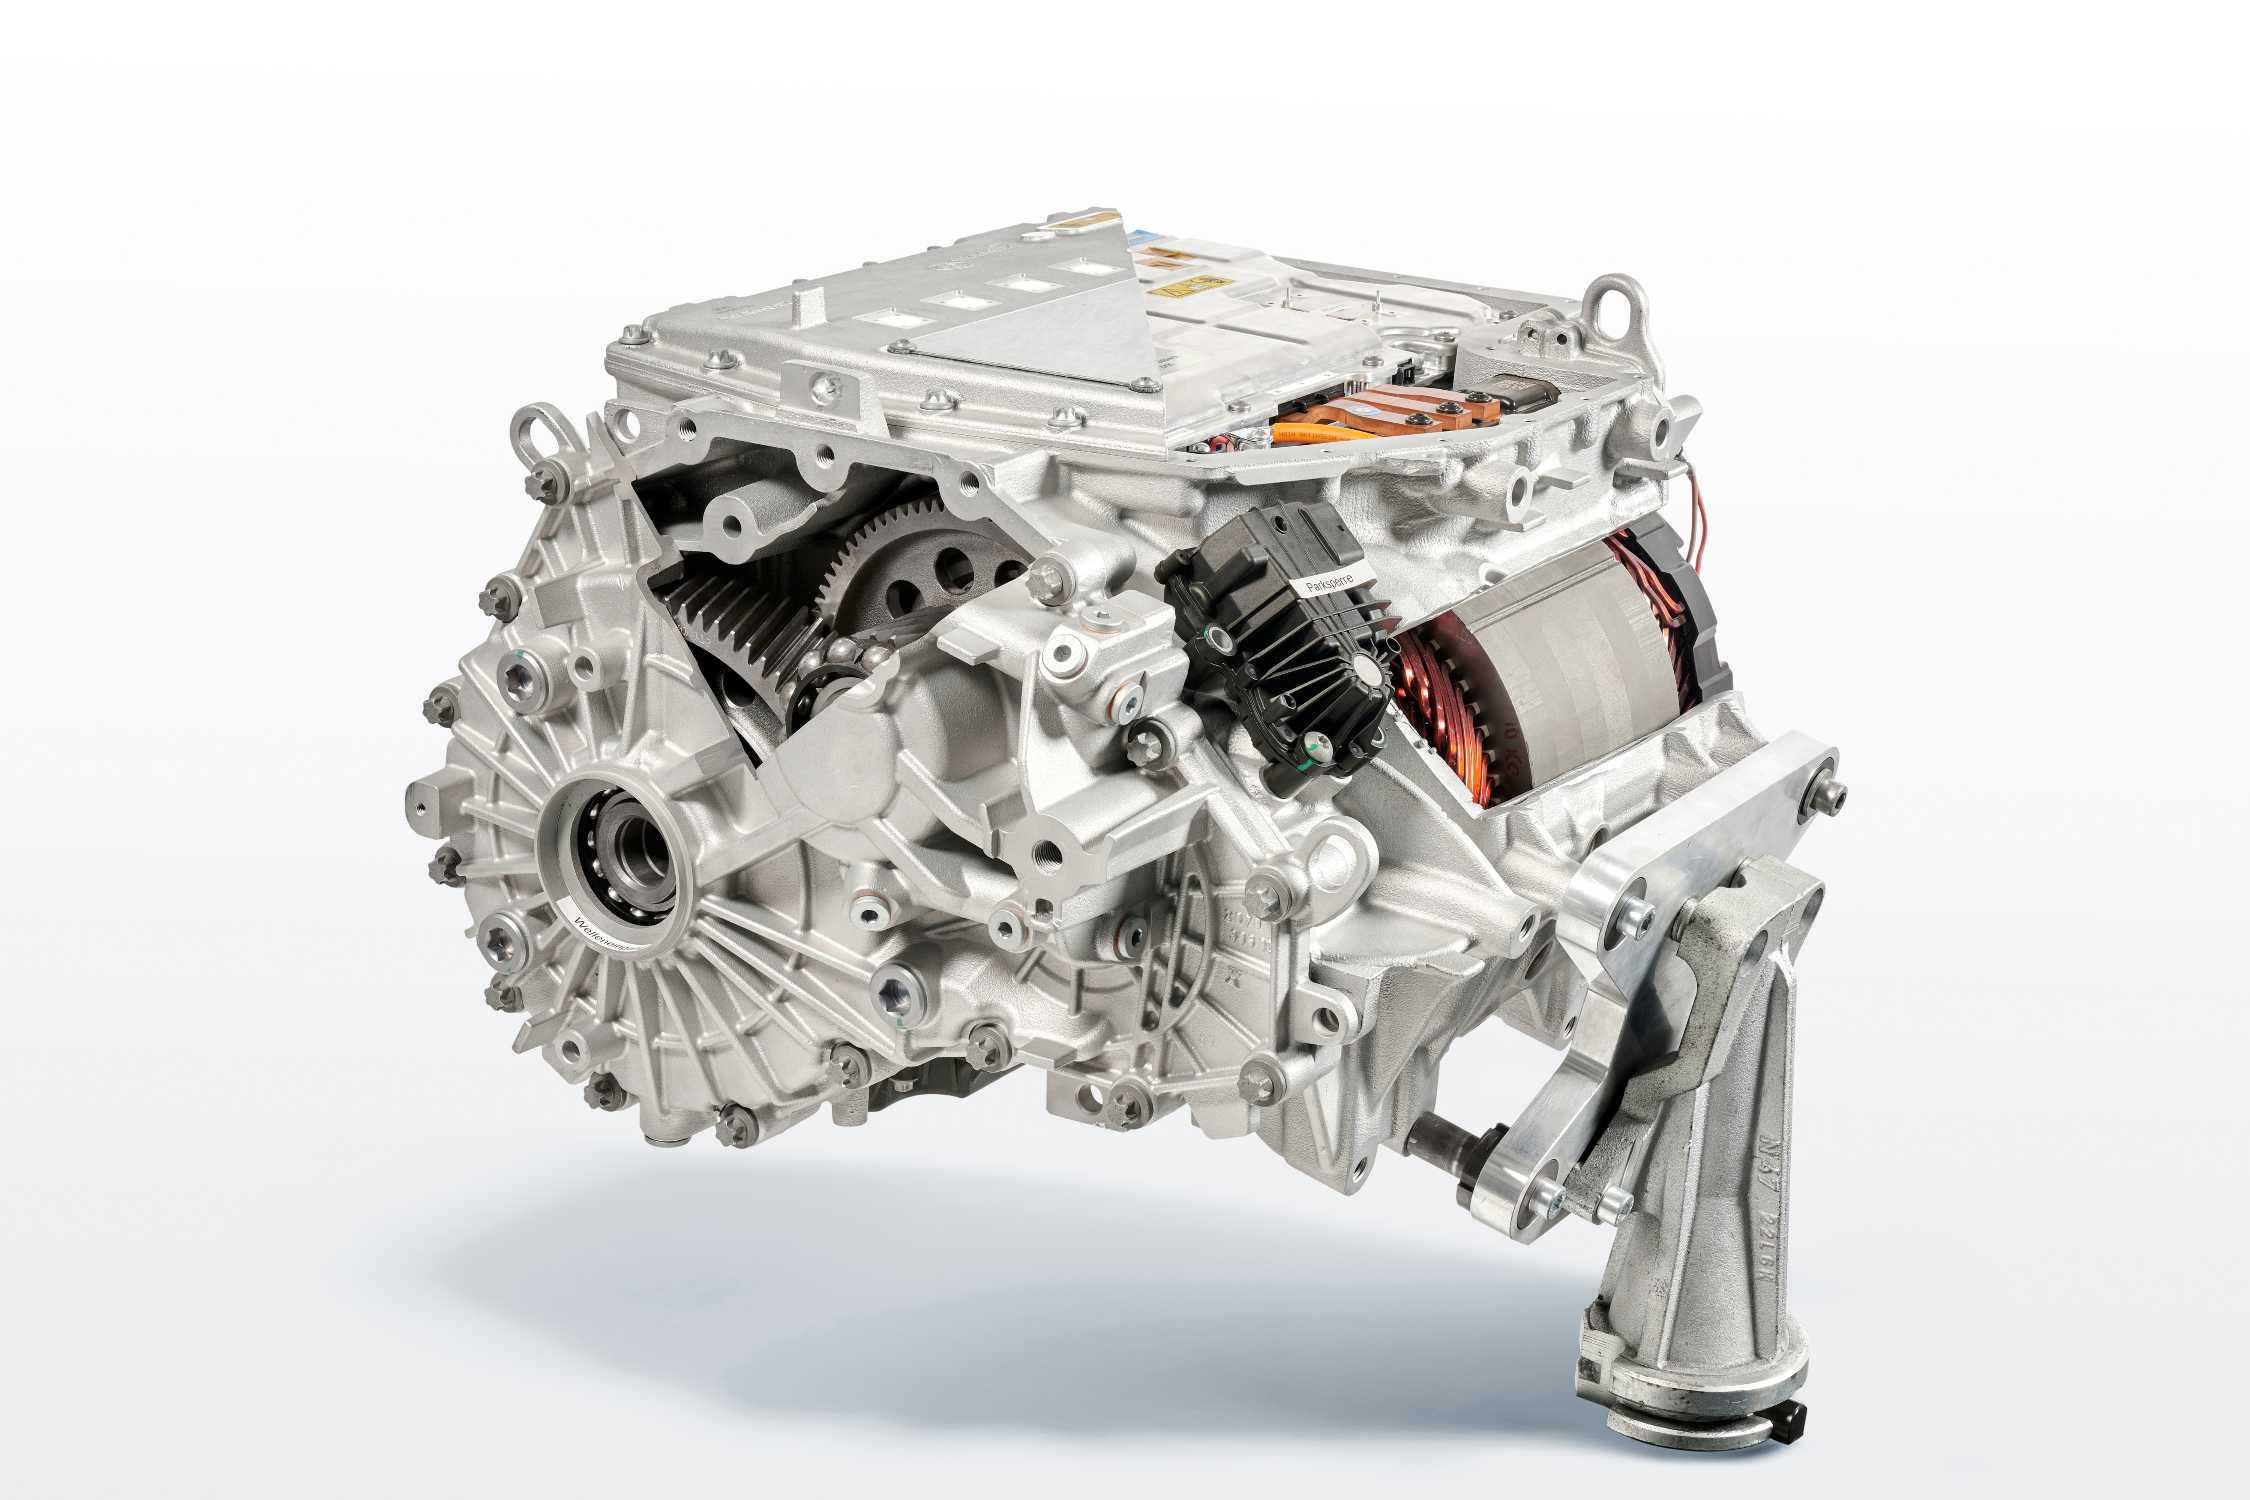 BMW iX3 Highly integrated e-drive-unit cut model (07/2020)